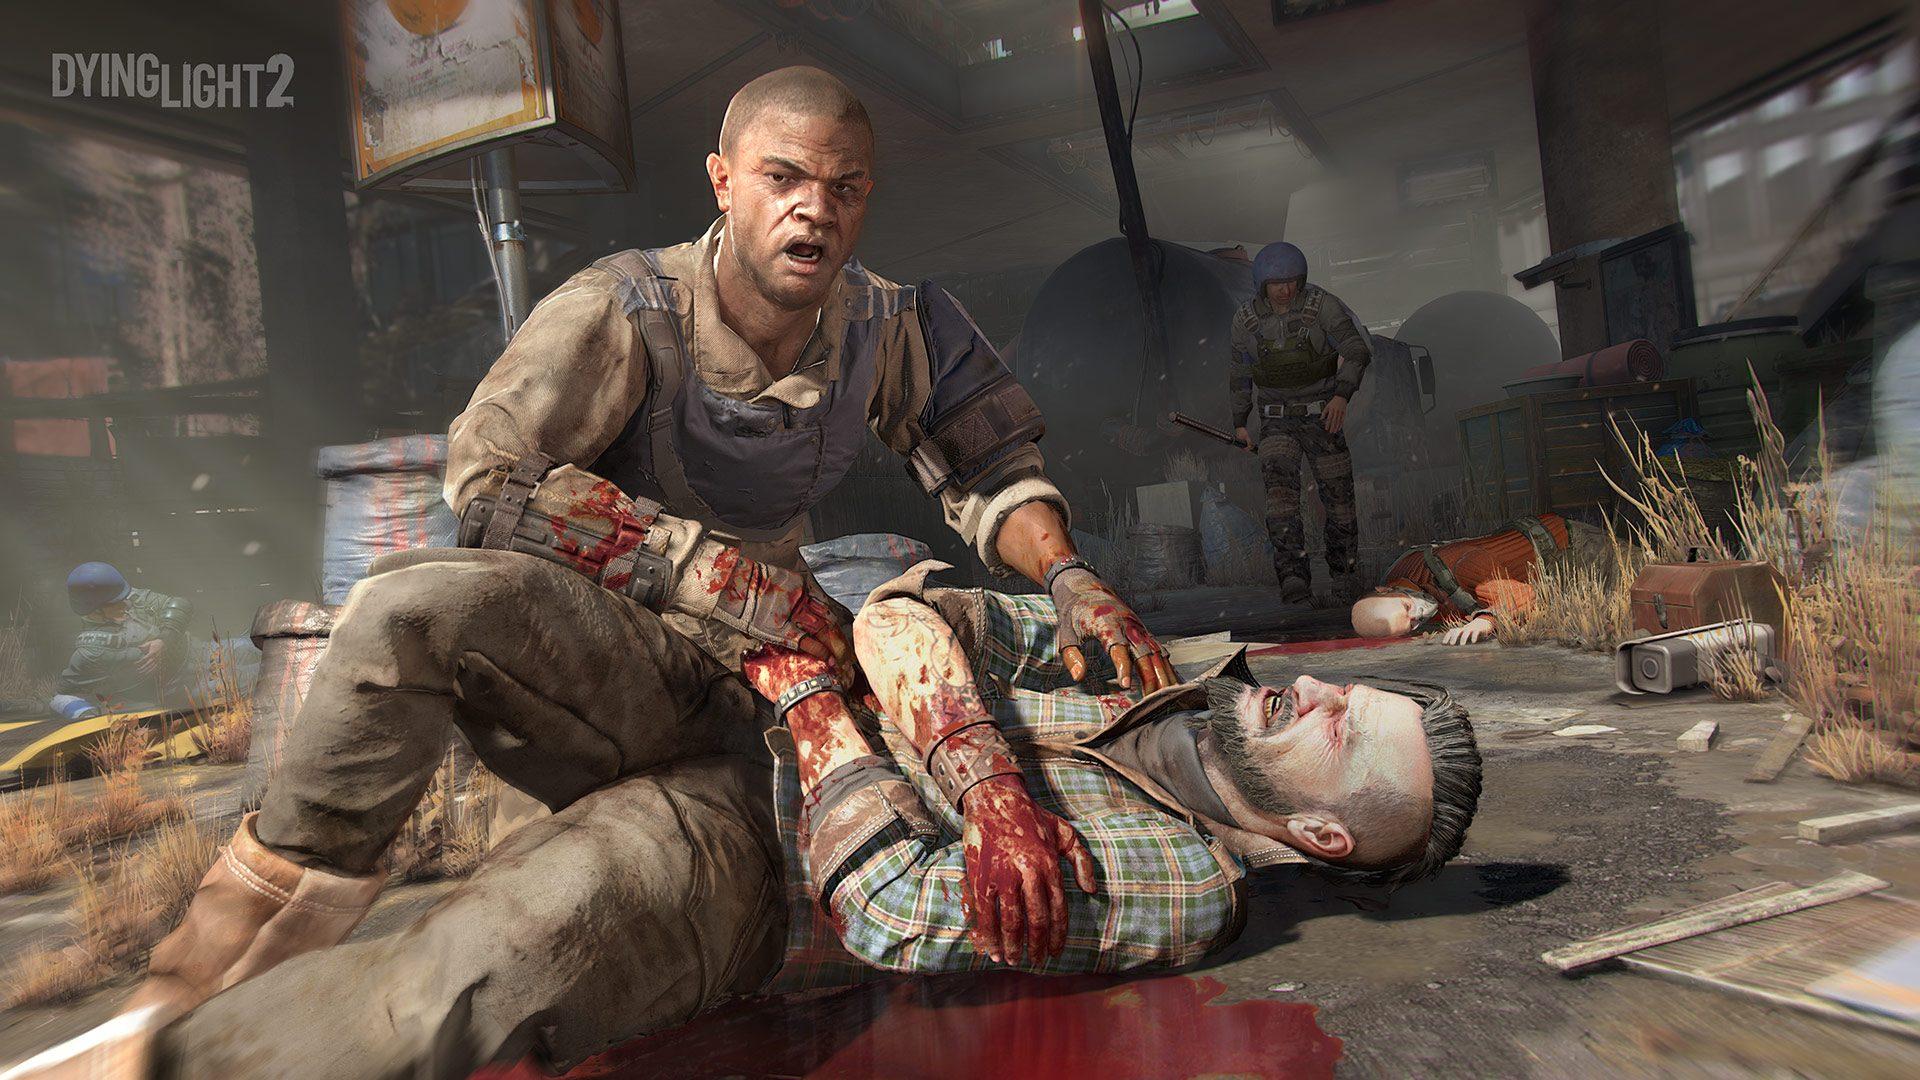 Dying Light 2 E3 preview | Rock Paper Shotgun